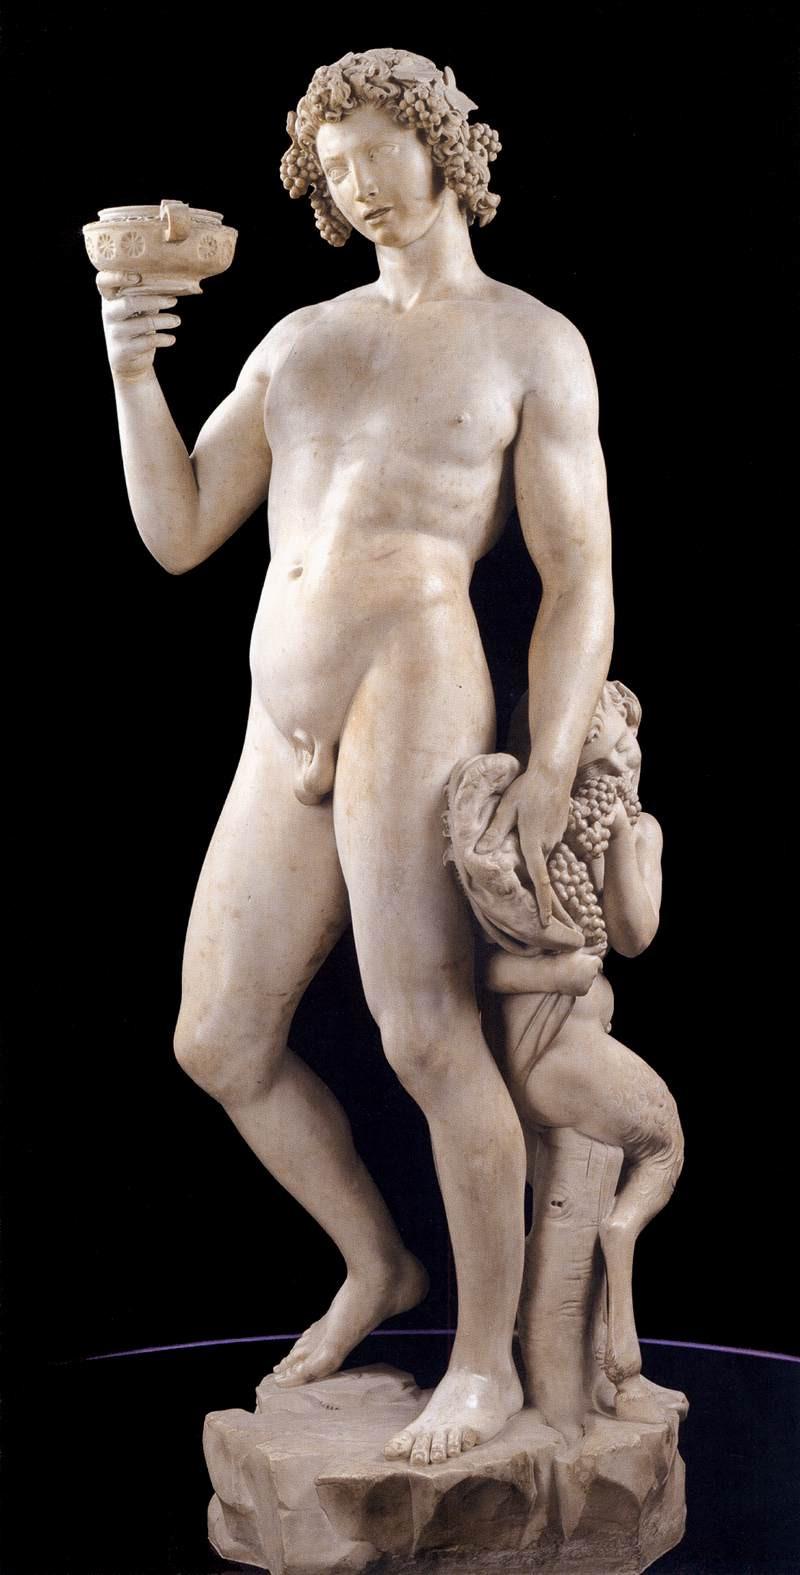 Michelangelo, 'Bacchus', 1497